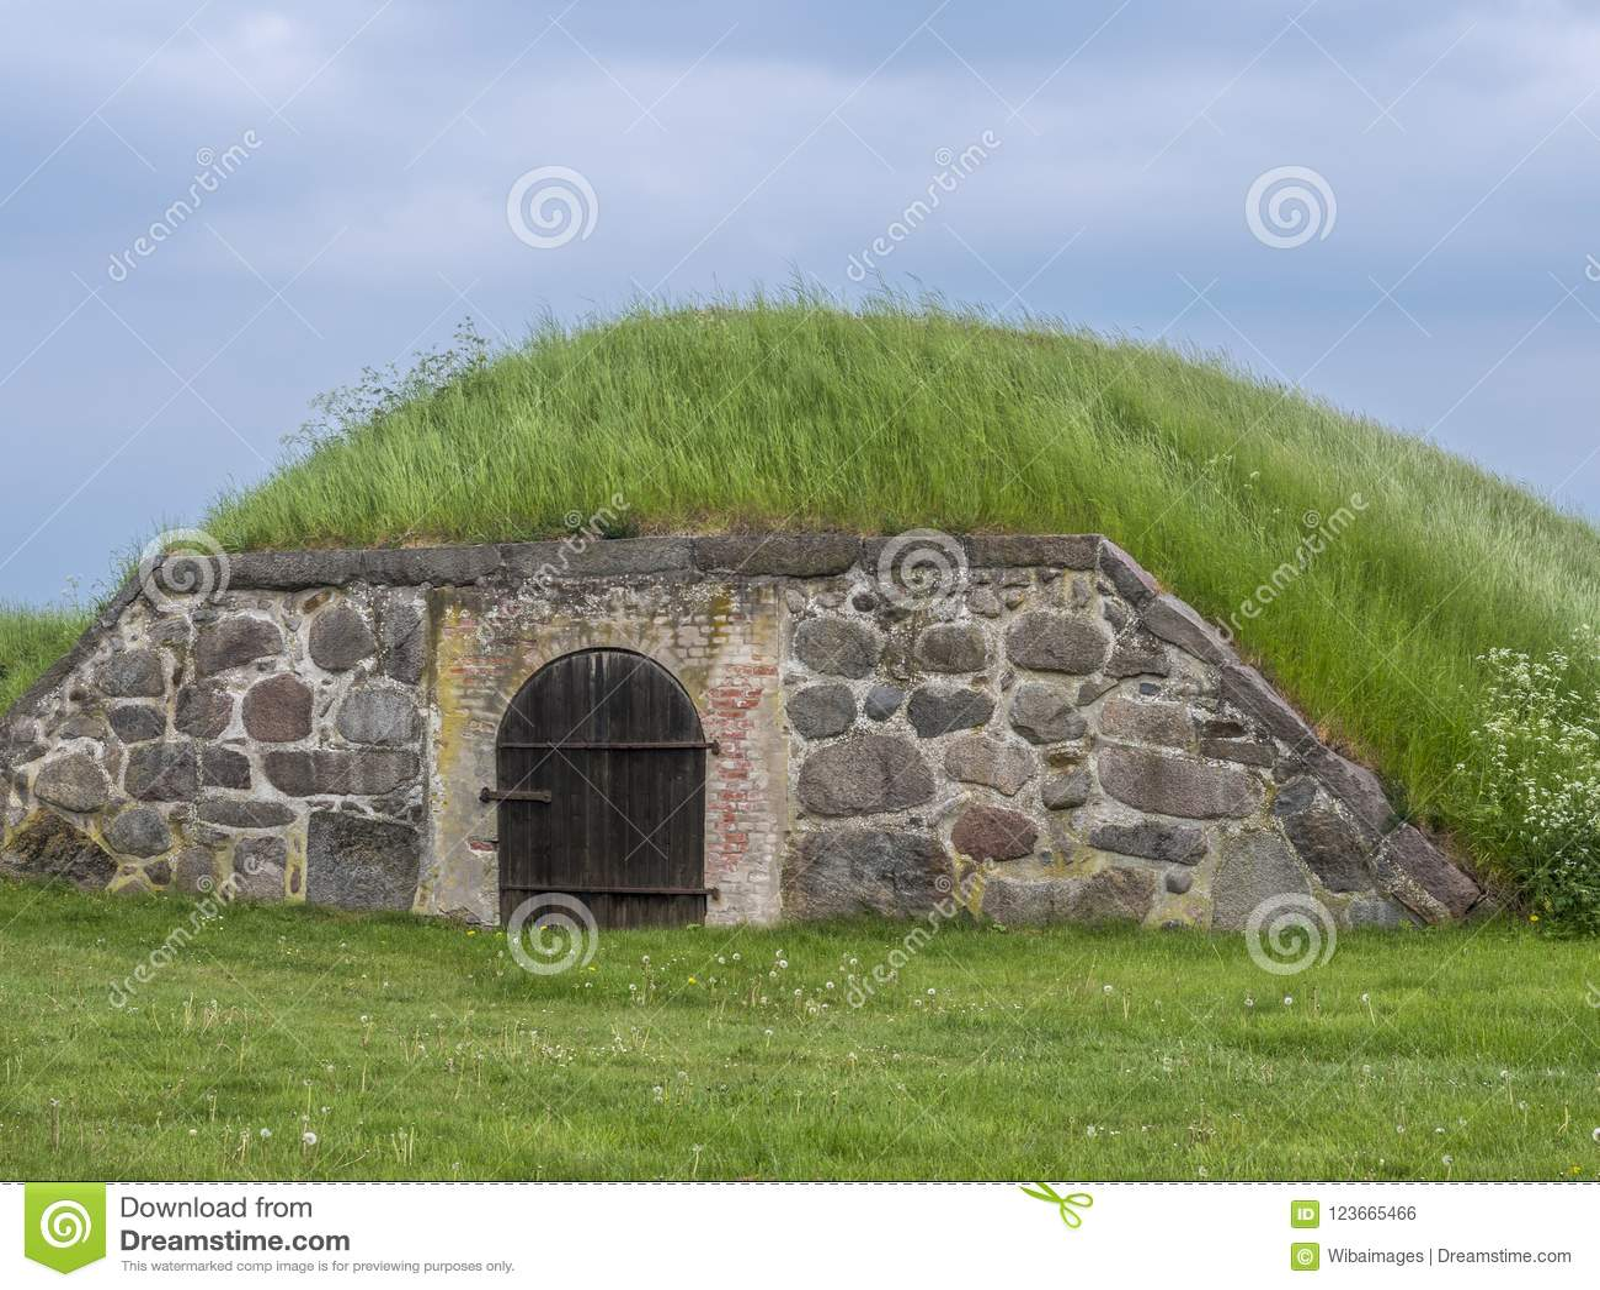 Jorda en kontakt källaren, den Kronborg slotten, Helsingor, Själland, Danmark, Europa